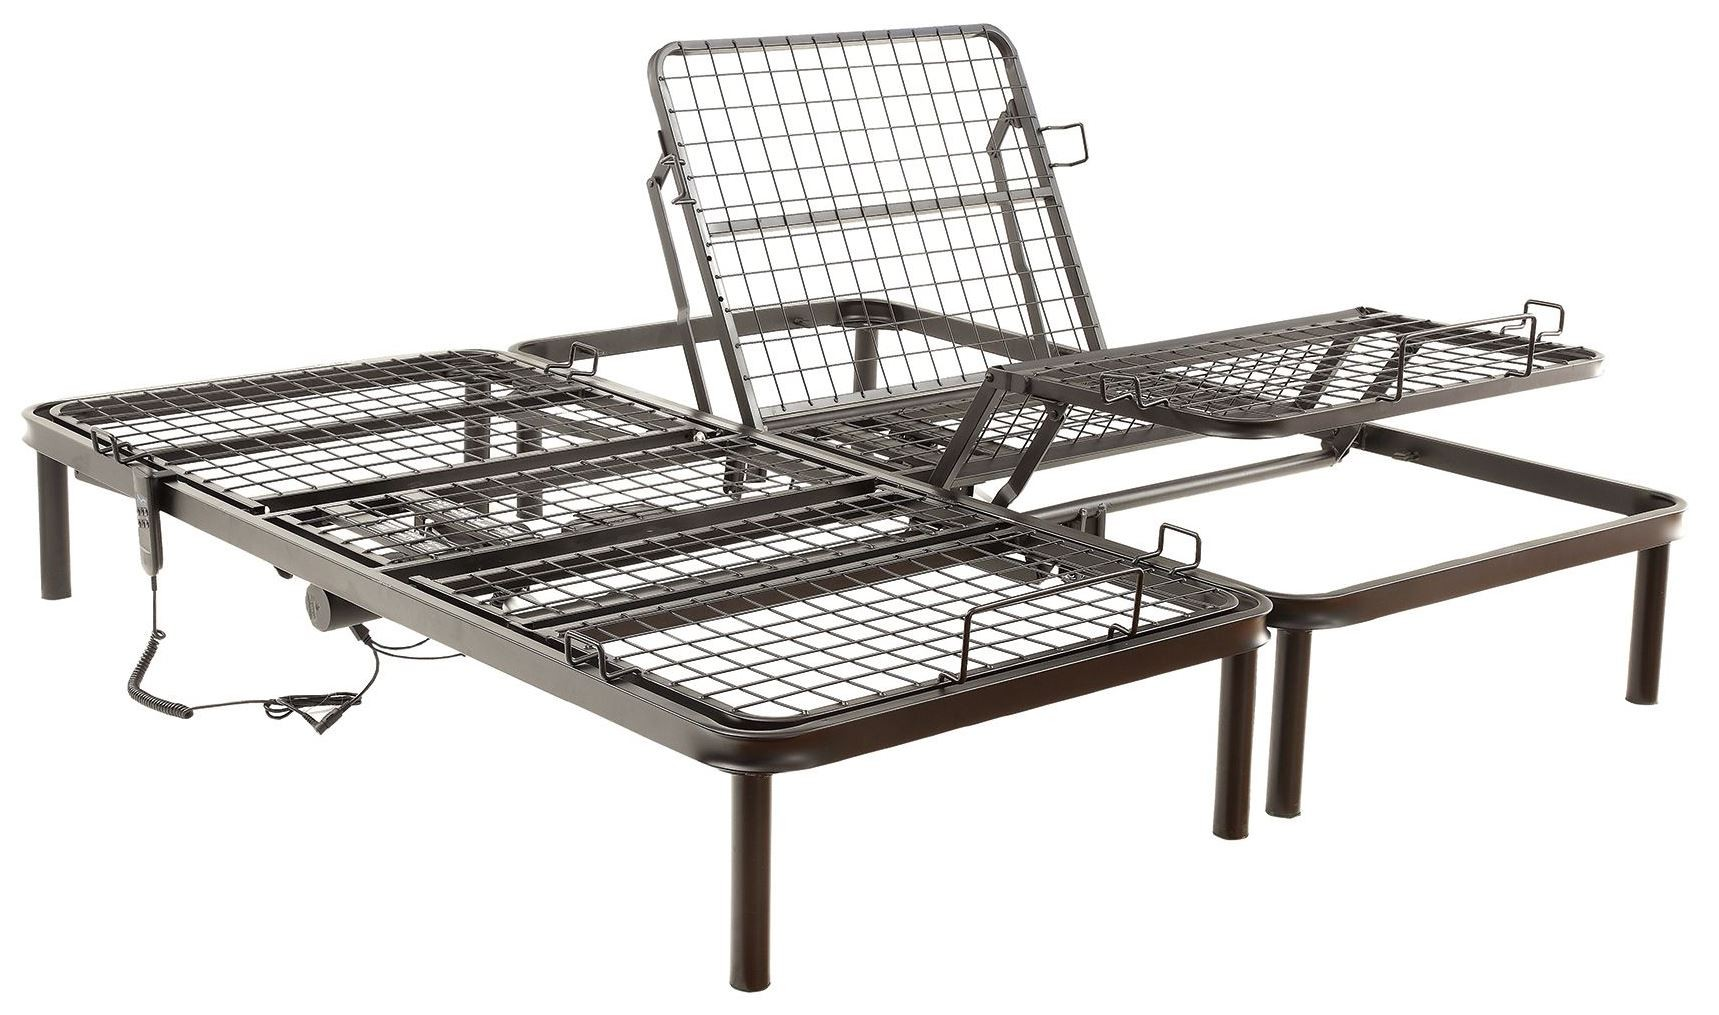 King Electric Adjustable Bed From Coaster Ke